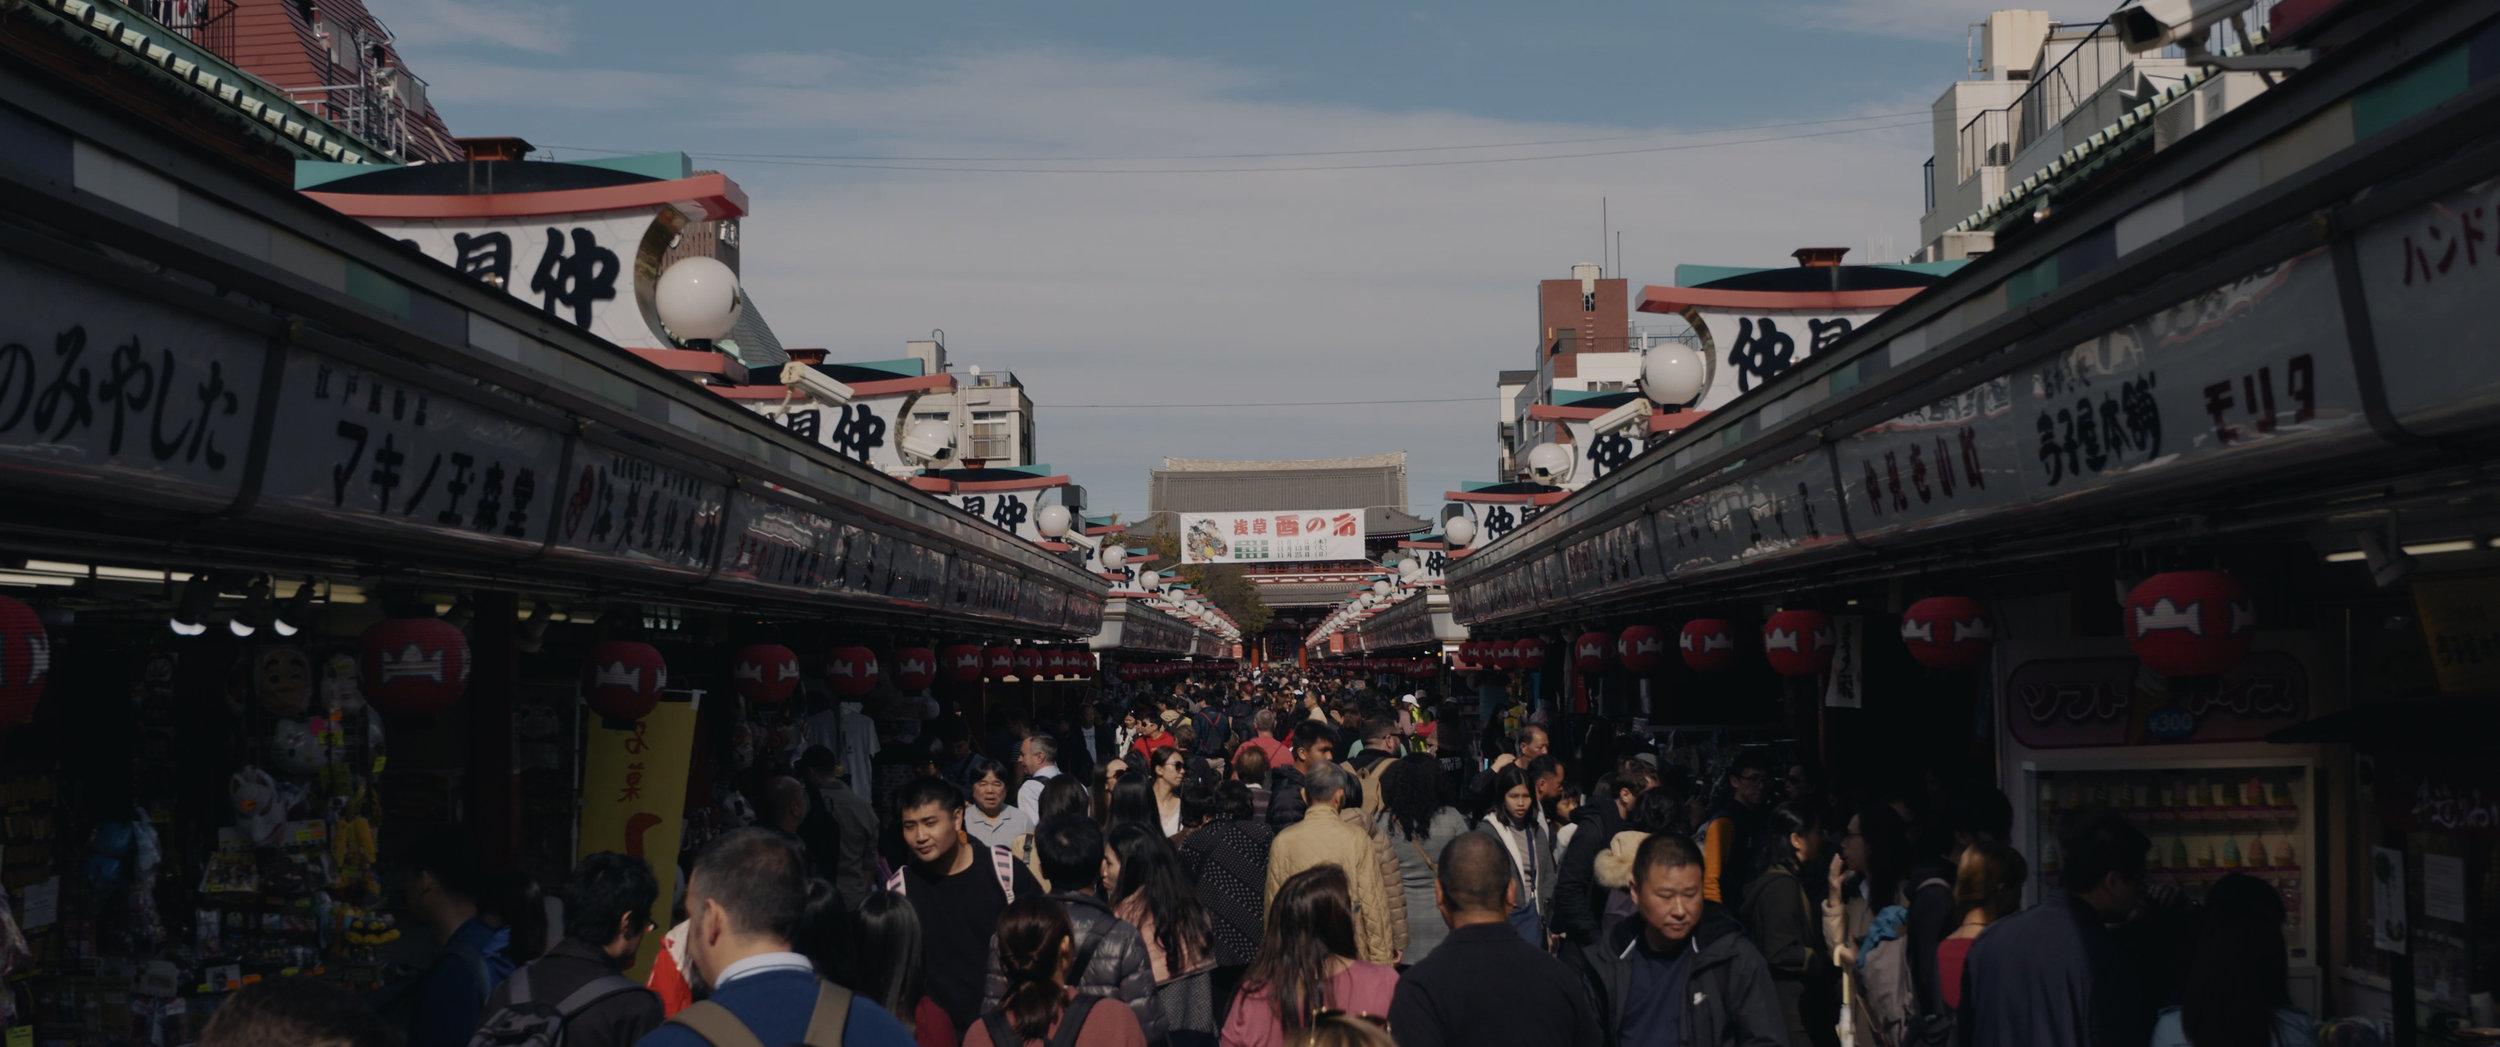 Copy of Japan